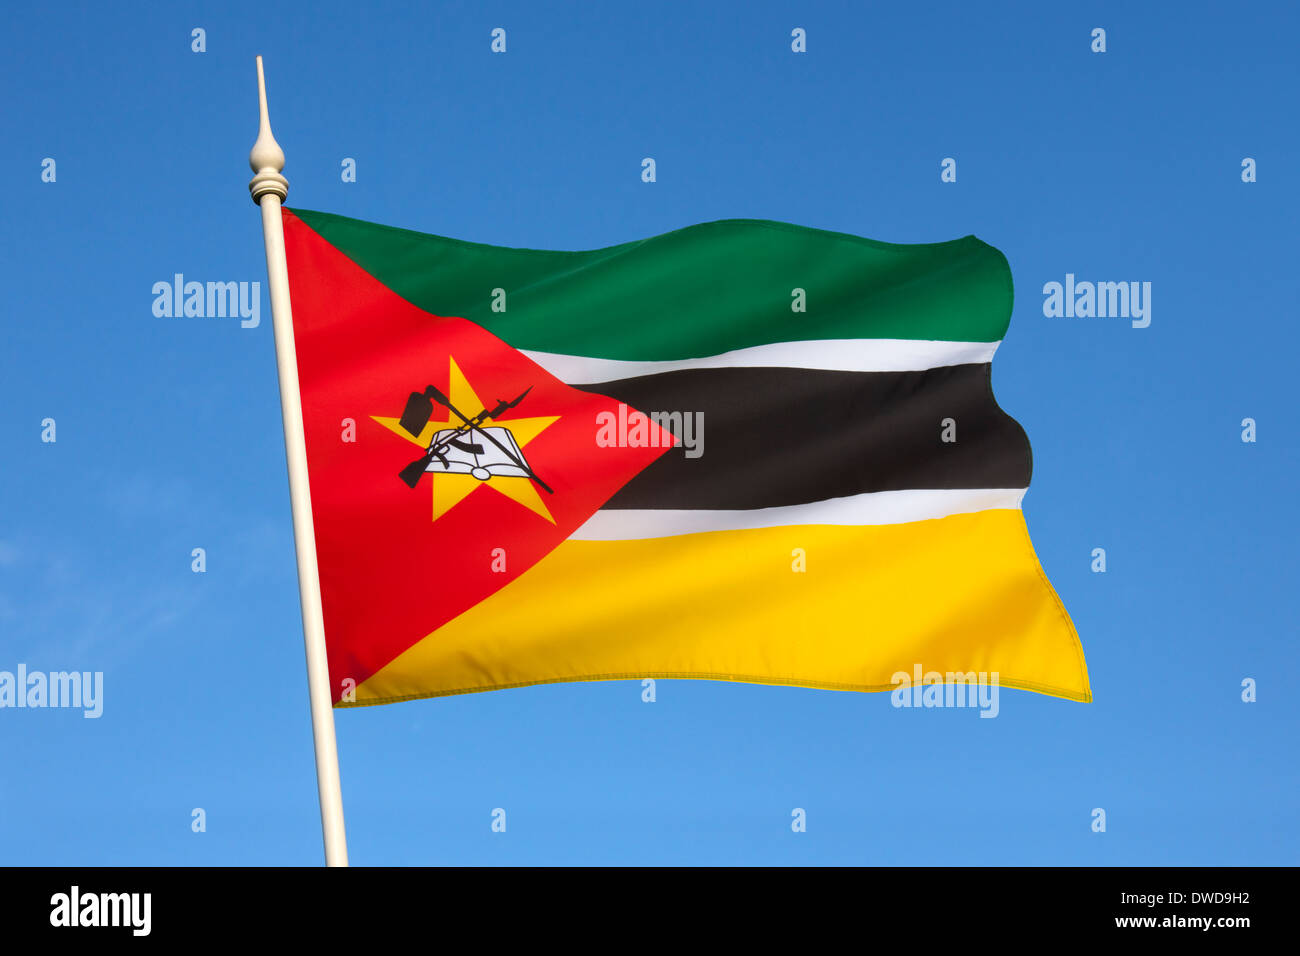 La bandera de Mozambique Imagen De Stock